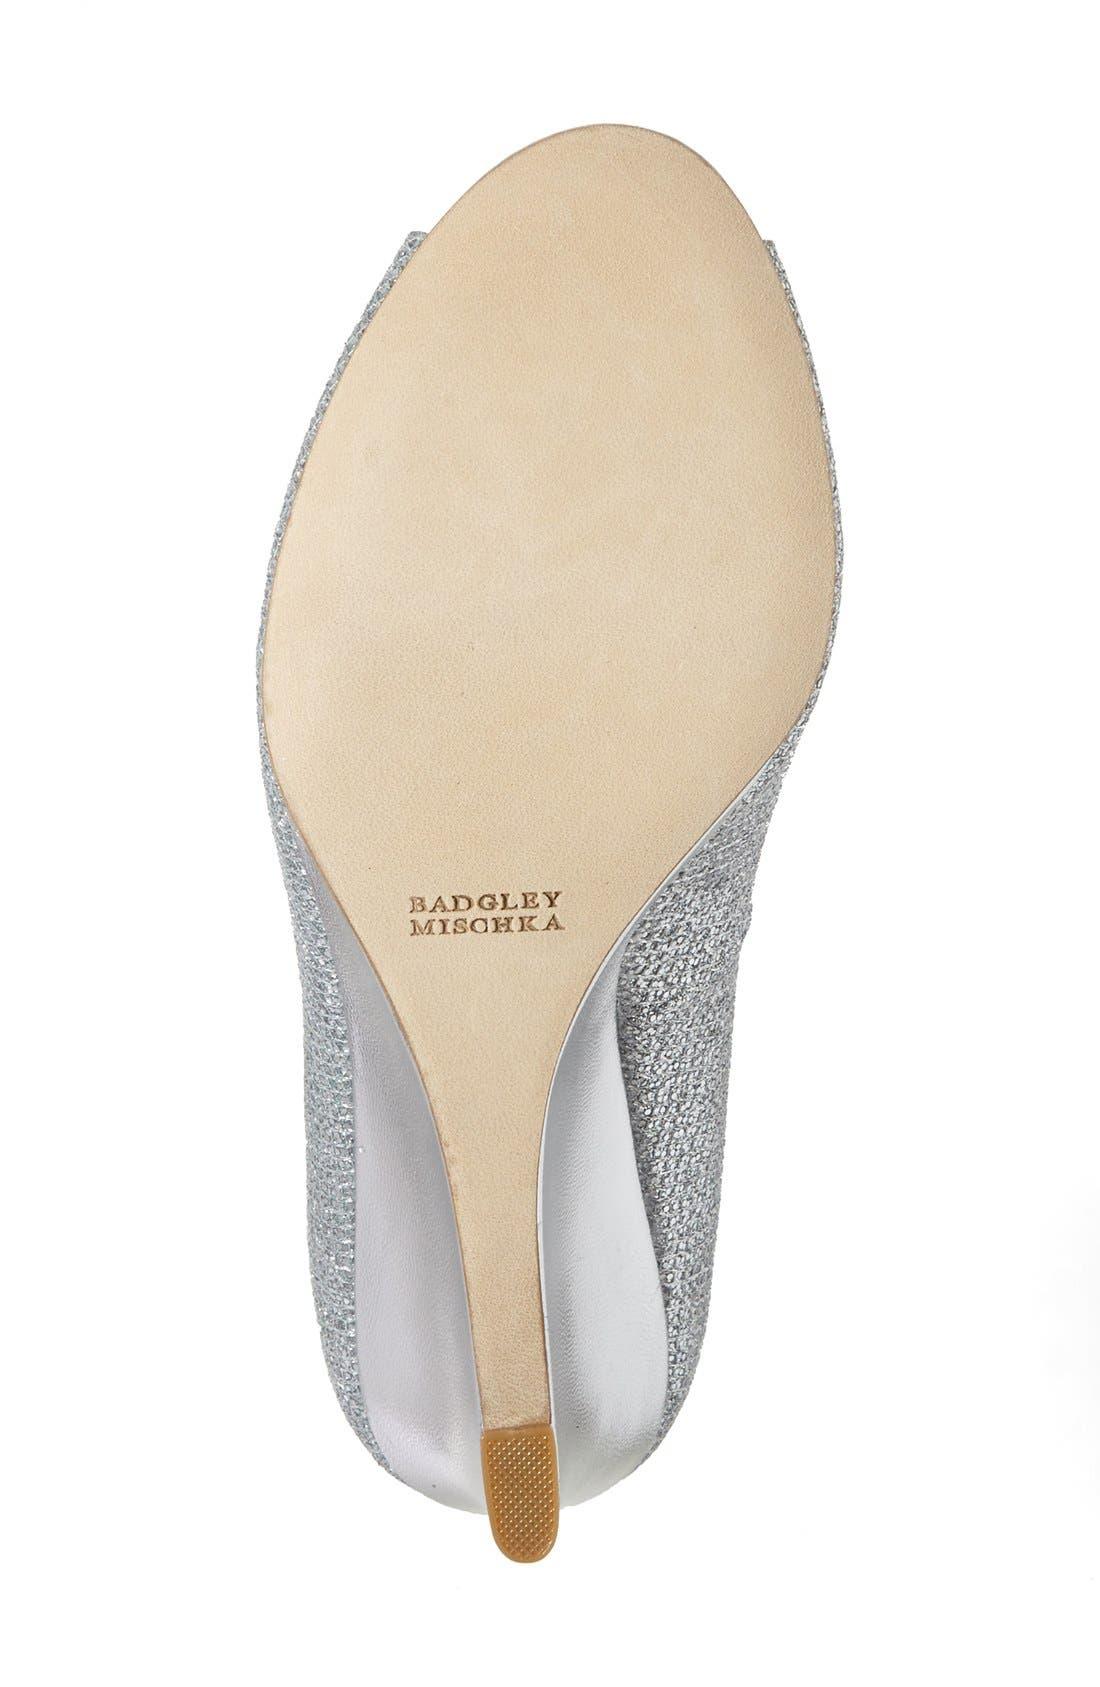 'Awake' Embellished Peep Toe Wedge Pump,                             Alternate thumbnail 4, color,                             Silver Glitter Fabric